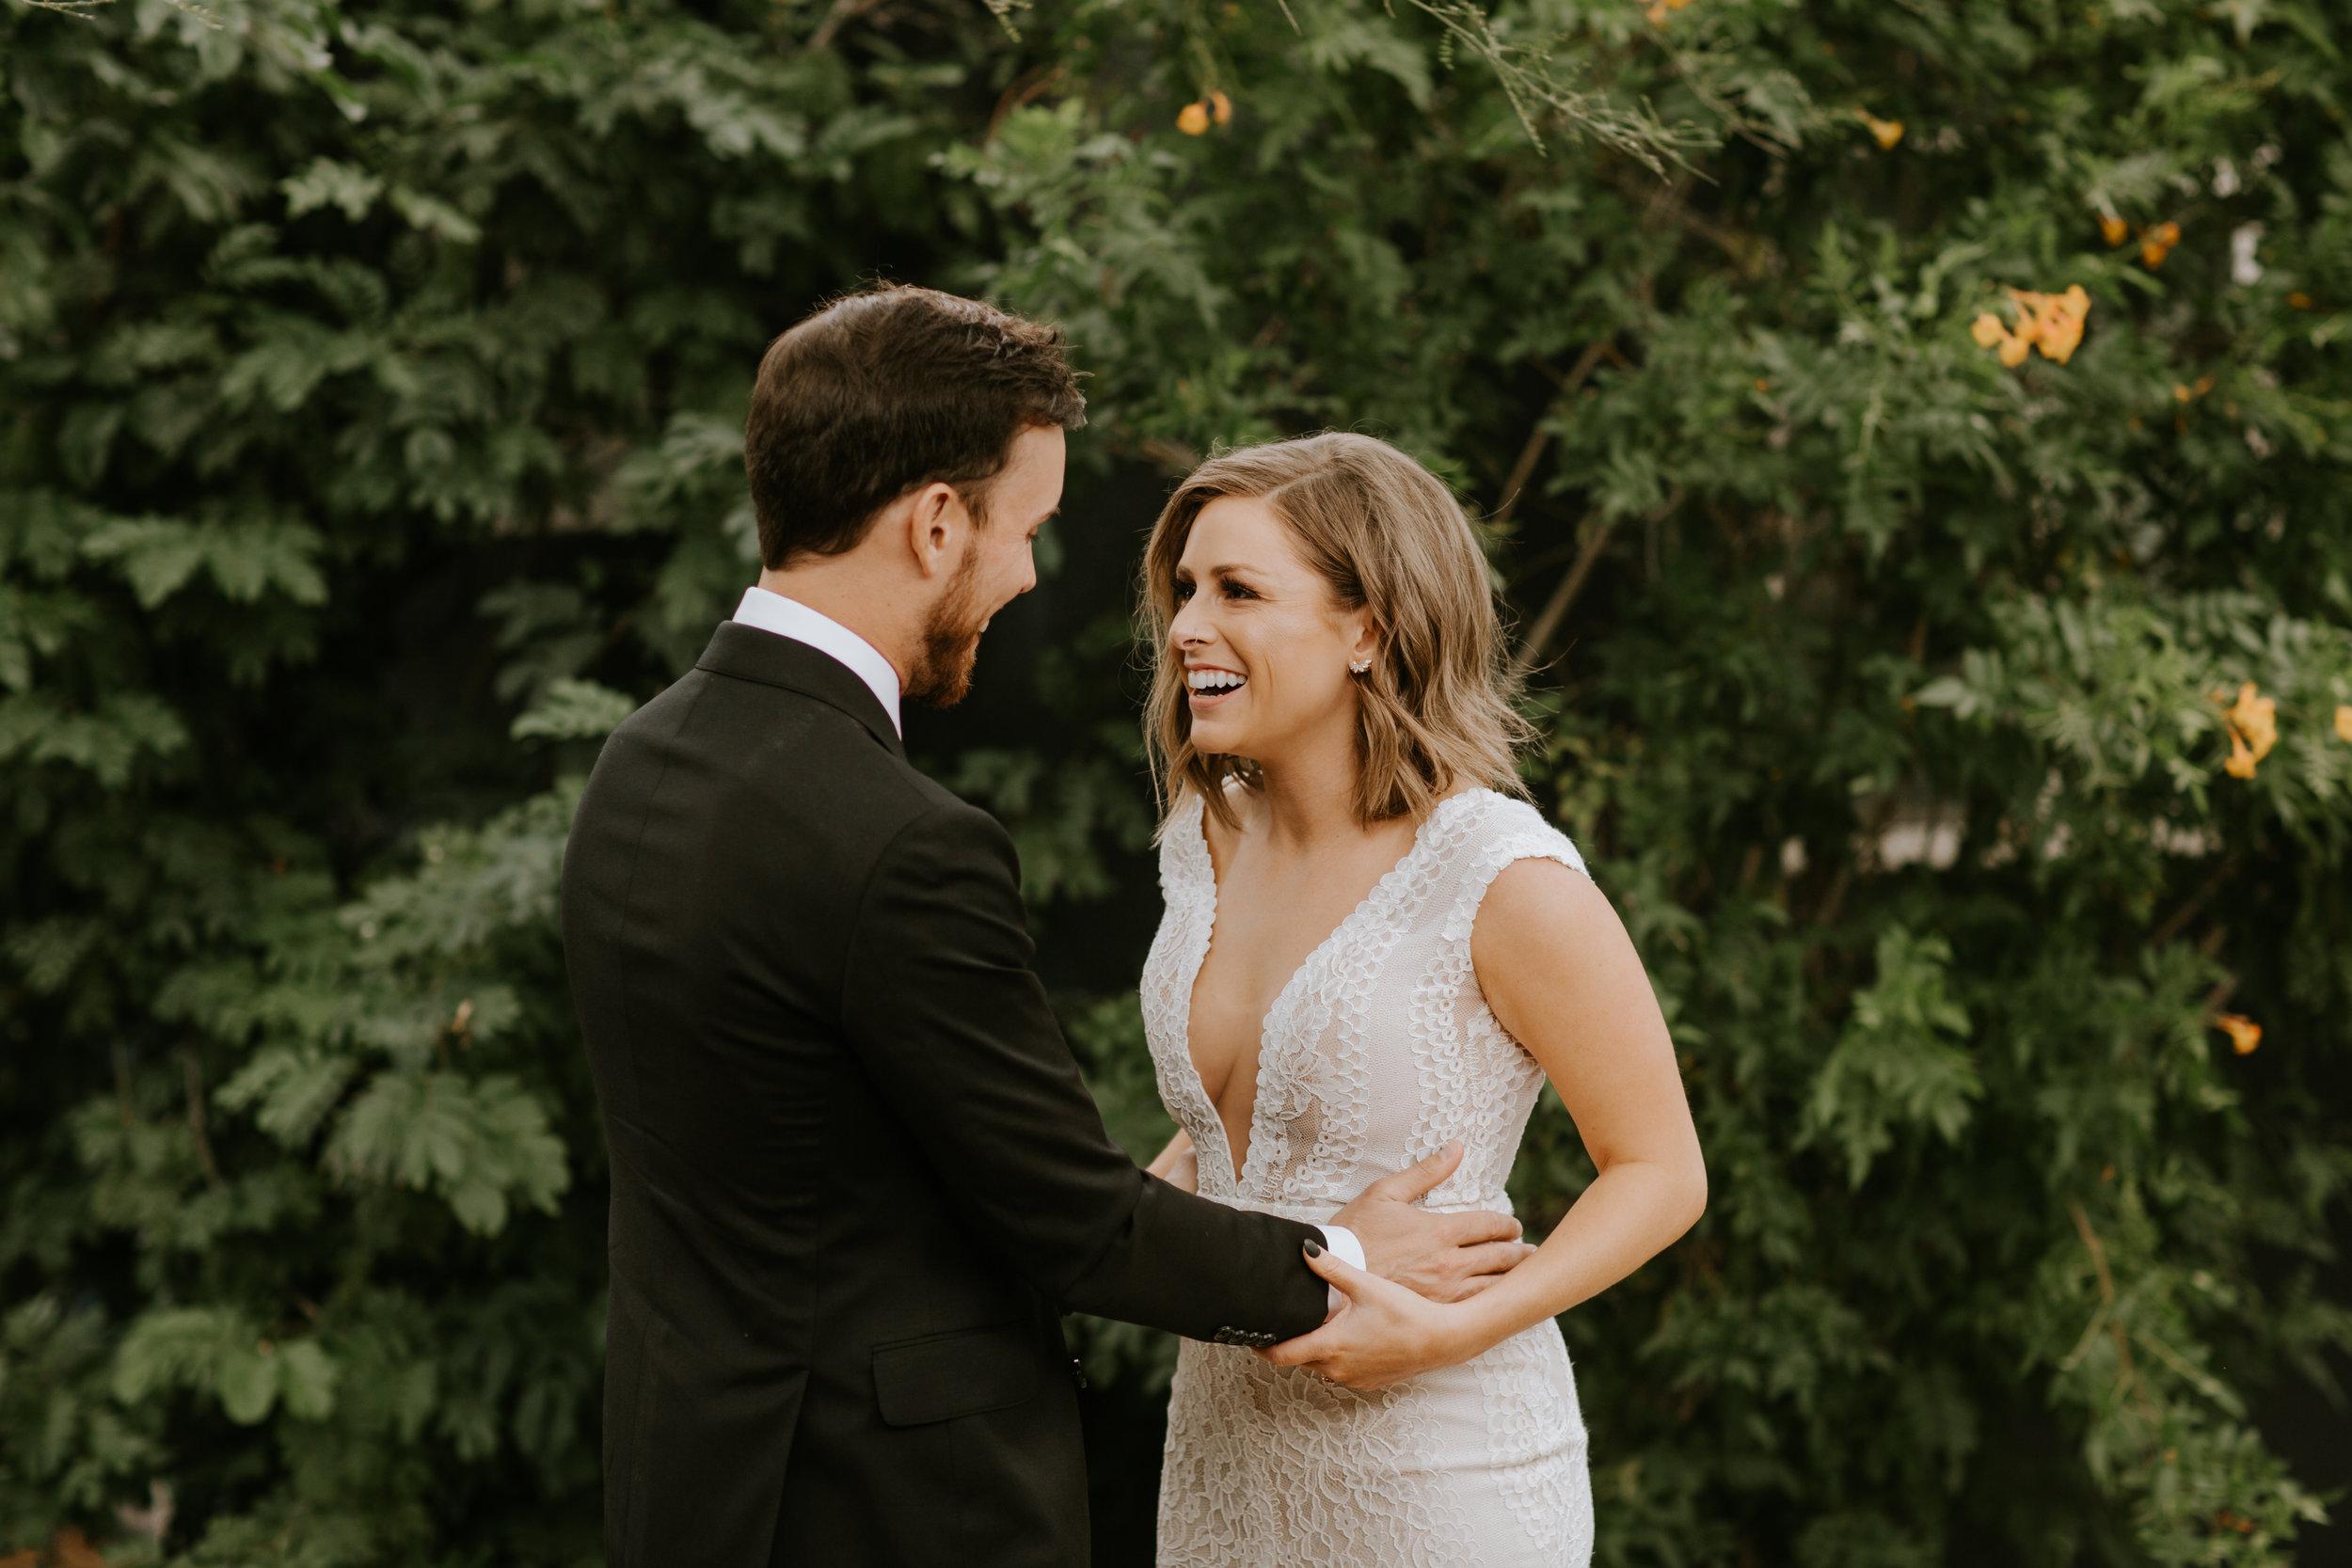 2019-05-26_Callie-Evan_Wedding_Joshua Tree_Paige Nelson_PREVIEWS HR-20.jpg